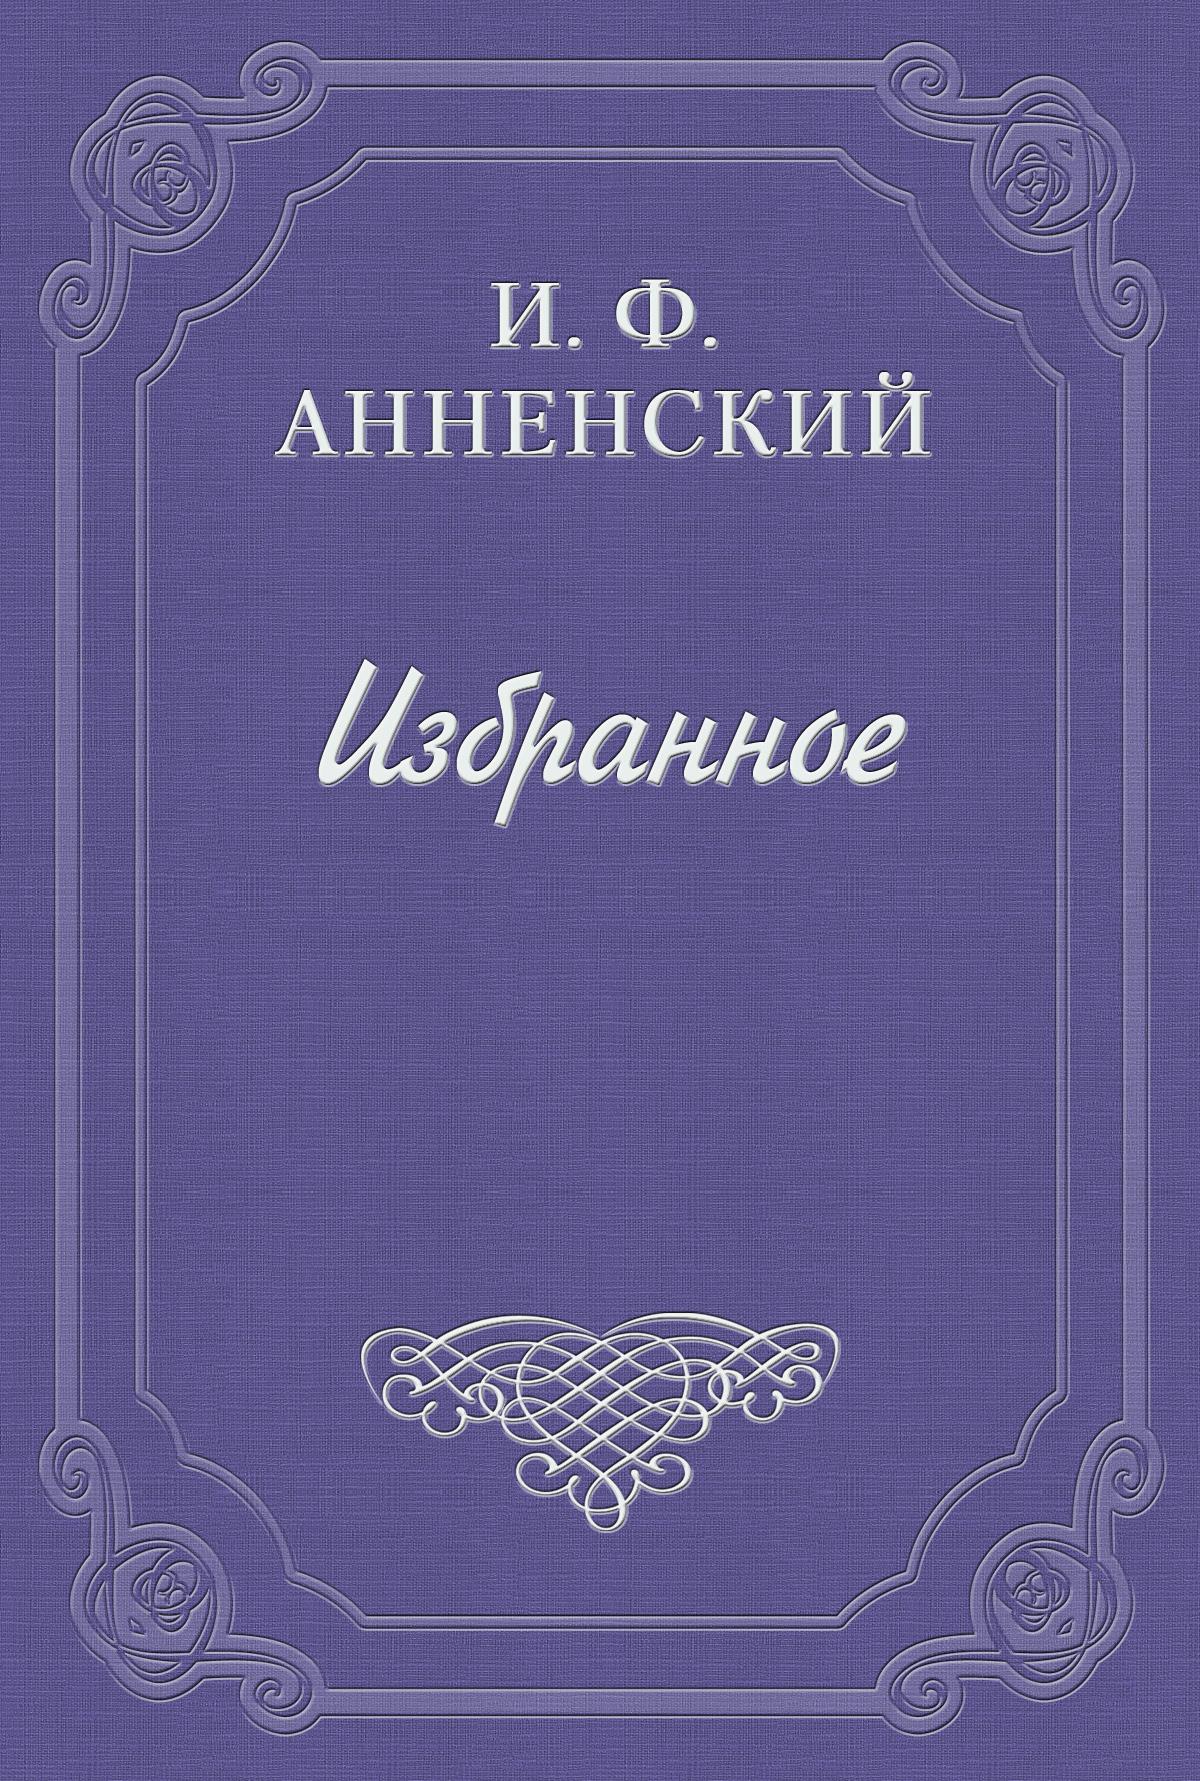 Иннокентий Фёдорович Анненский Полное собрание стихотворений wi fi адаптер asus usb ac51